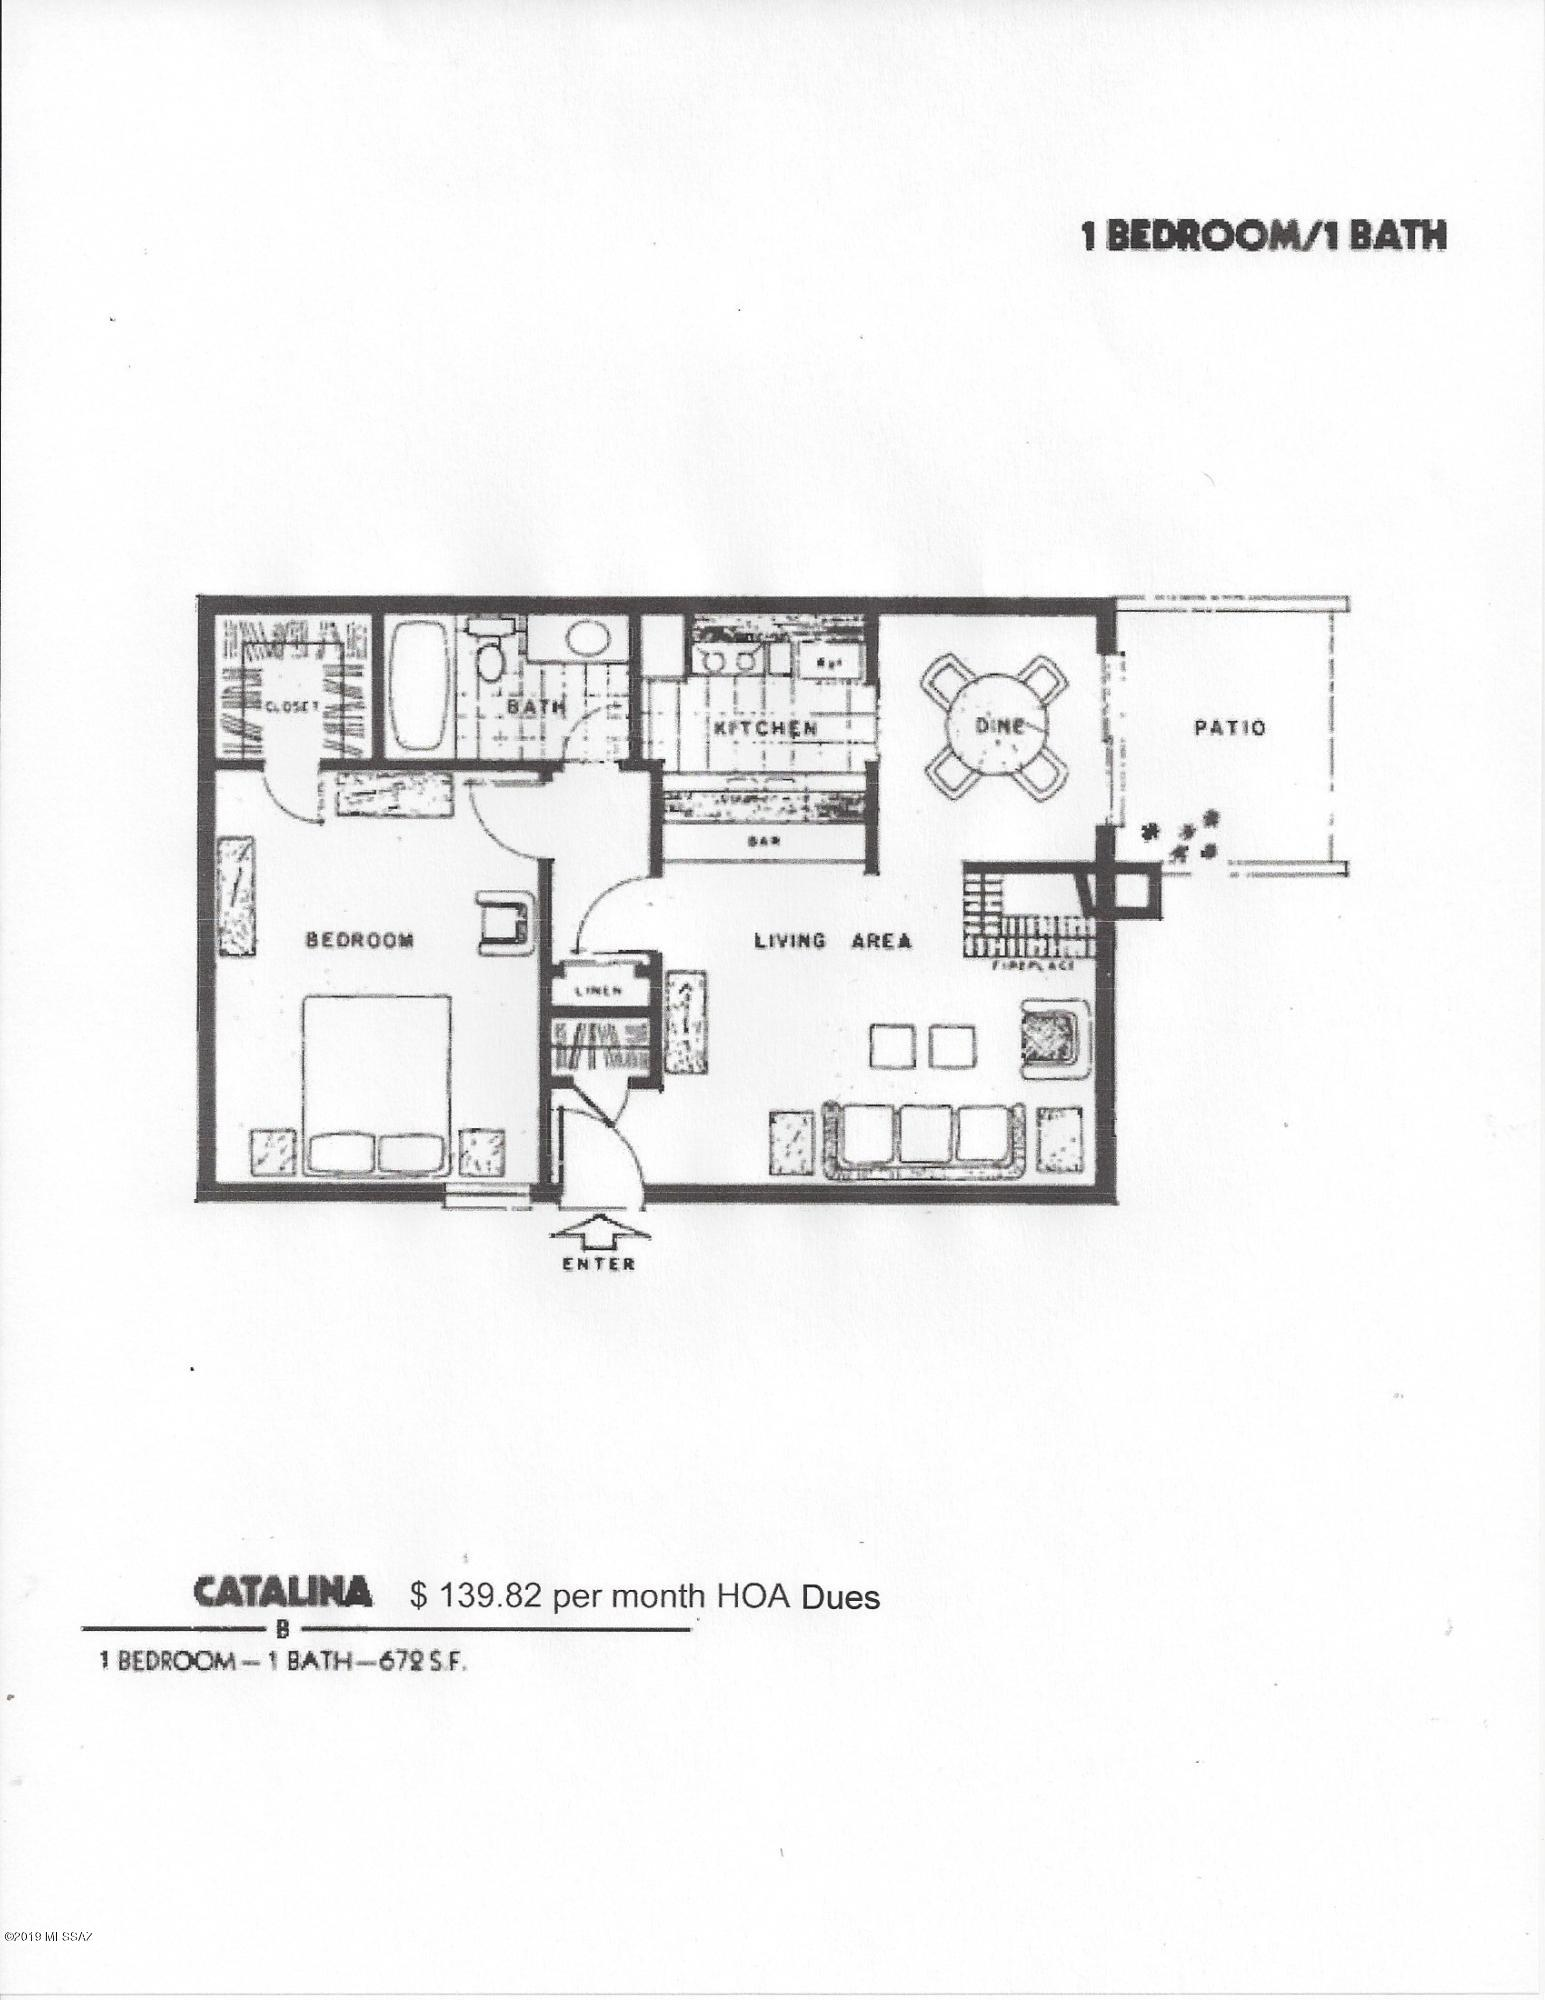 1600 N Wilmot Road, 156, Tucson, AZ 85712 (MLS# 21829897